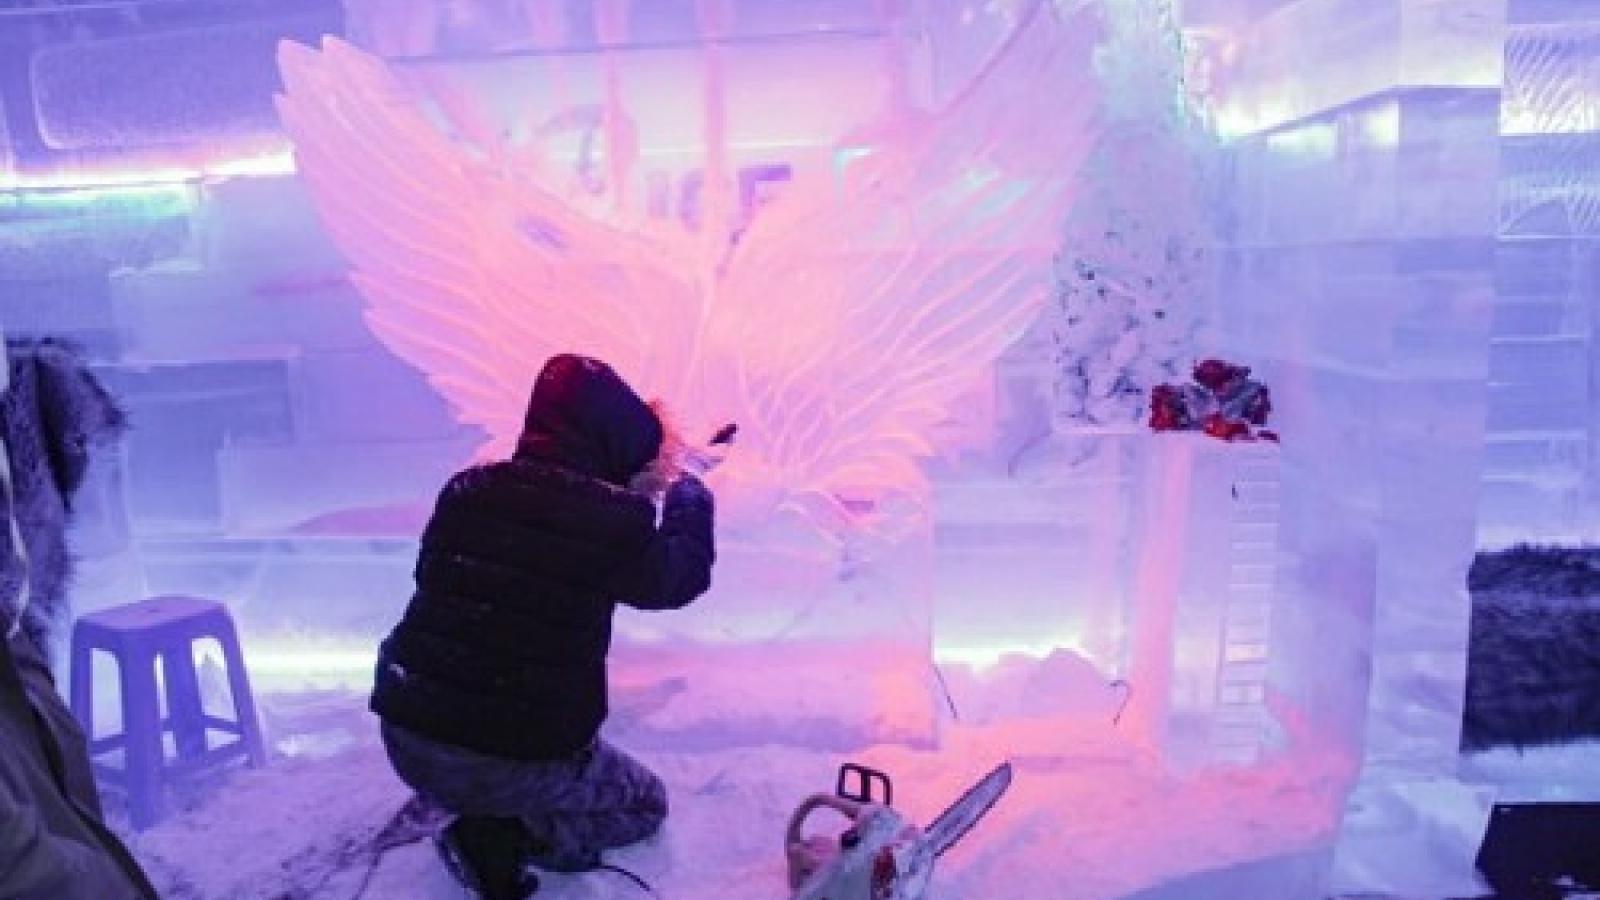 In tropical Saigon, sculptors carve ice into ephemeral artworks